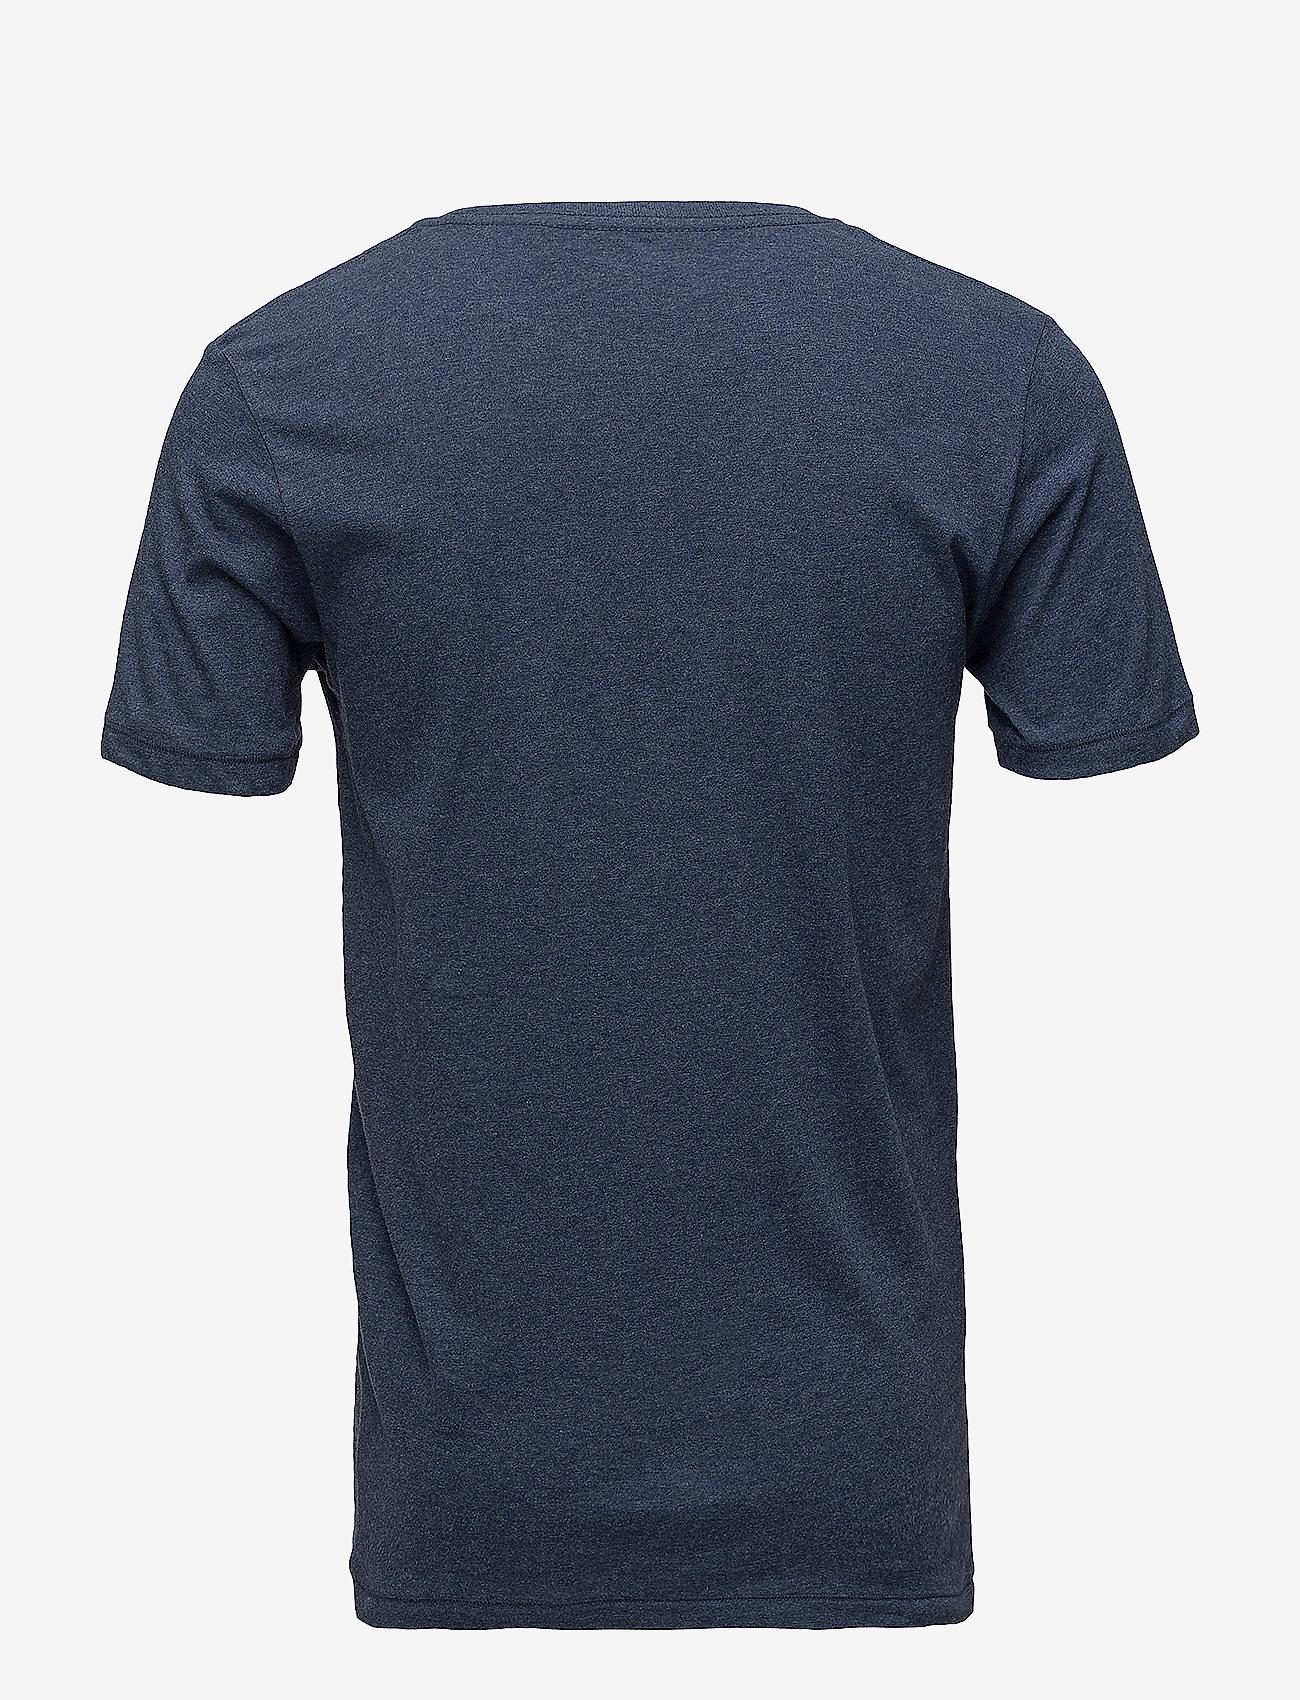 Knowledge Cotton Apparel - ALDER basic tee - GOTS/Vegan - basic t-krekli - insigna blue melange - 1